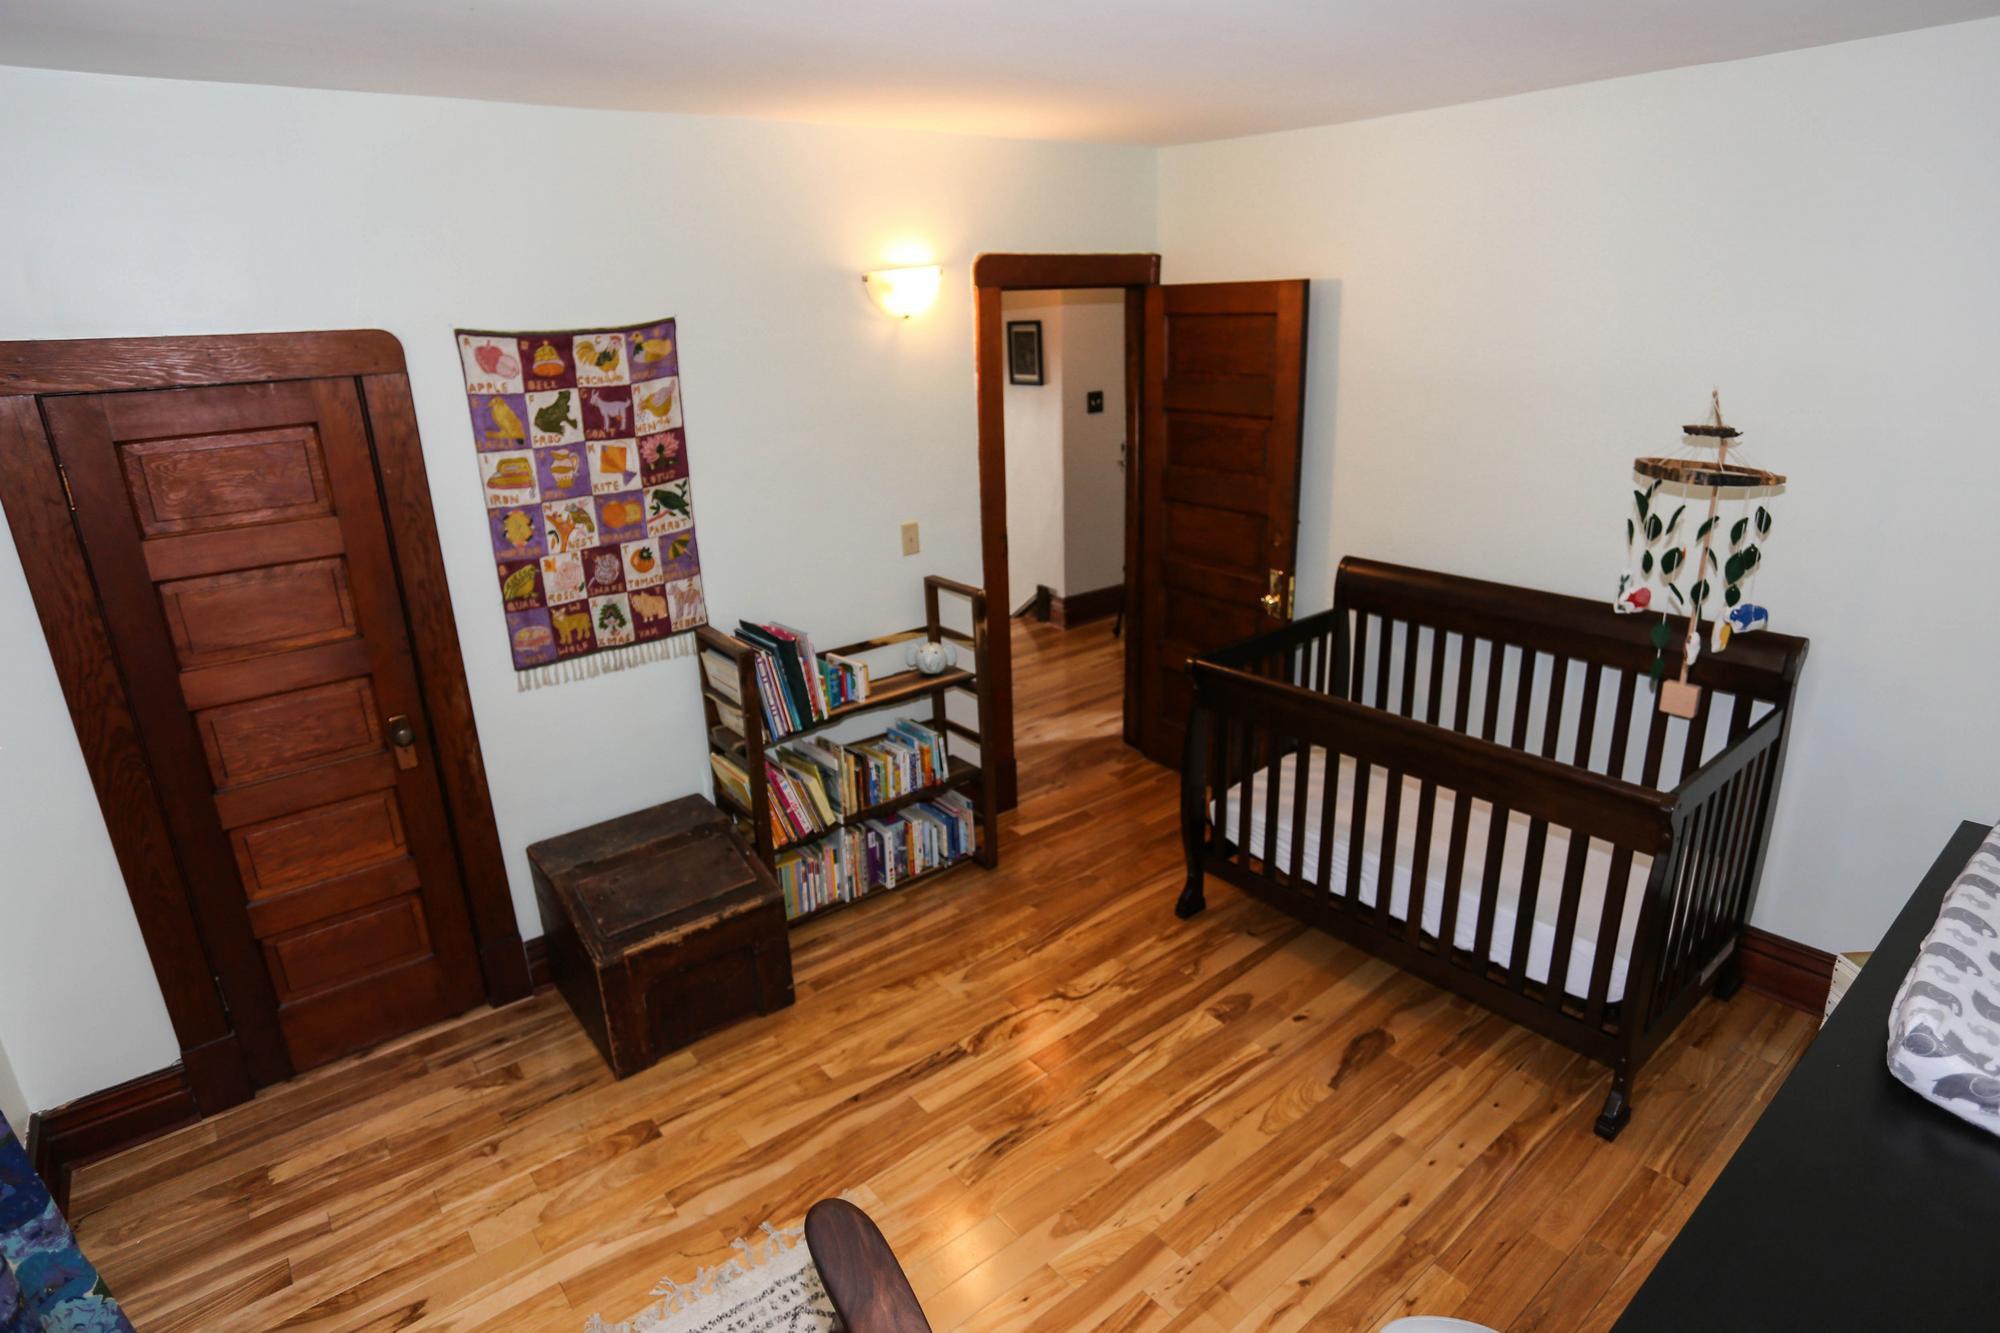 Photo 22: Photos: 105 Evanson Street in Winnipeg: Wolseley Single Family Detached for sale (5B)  : MLS®# 1821900